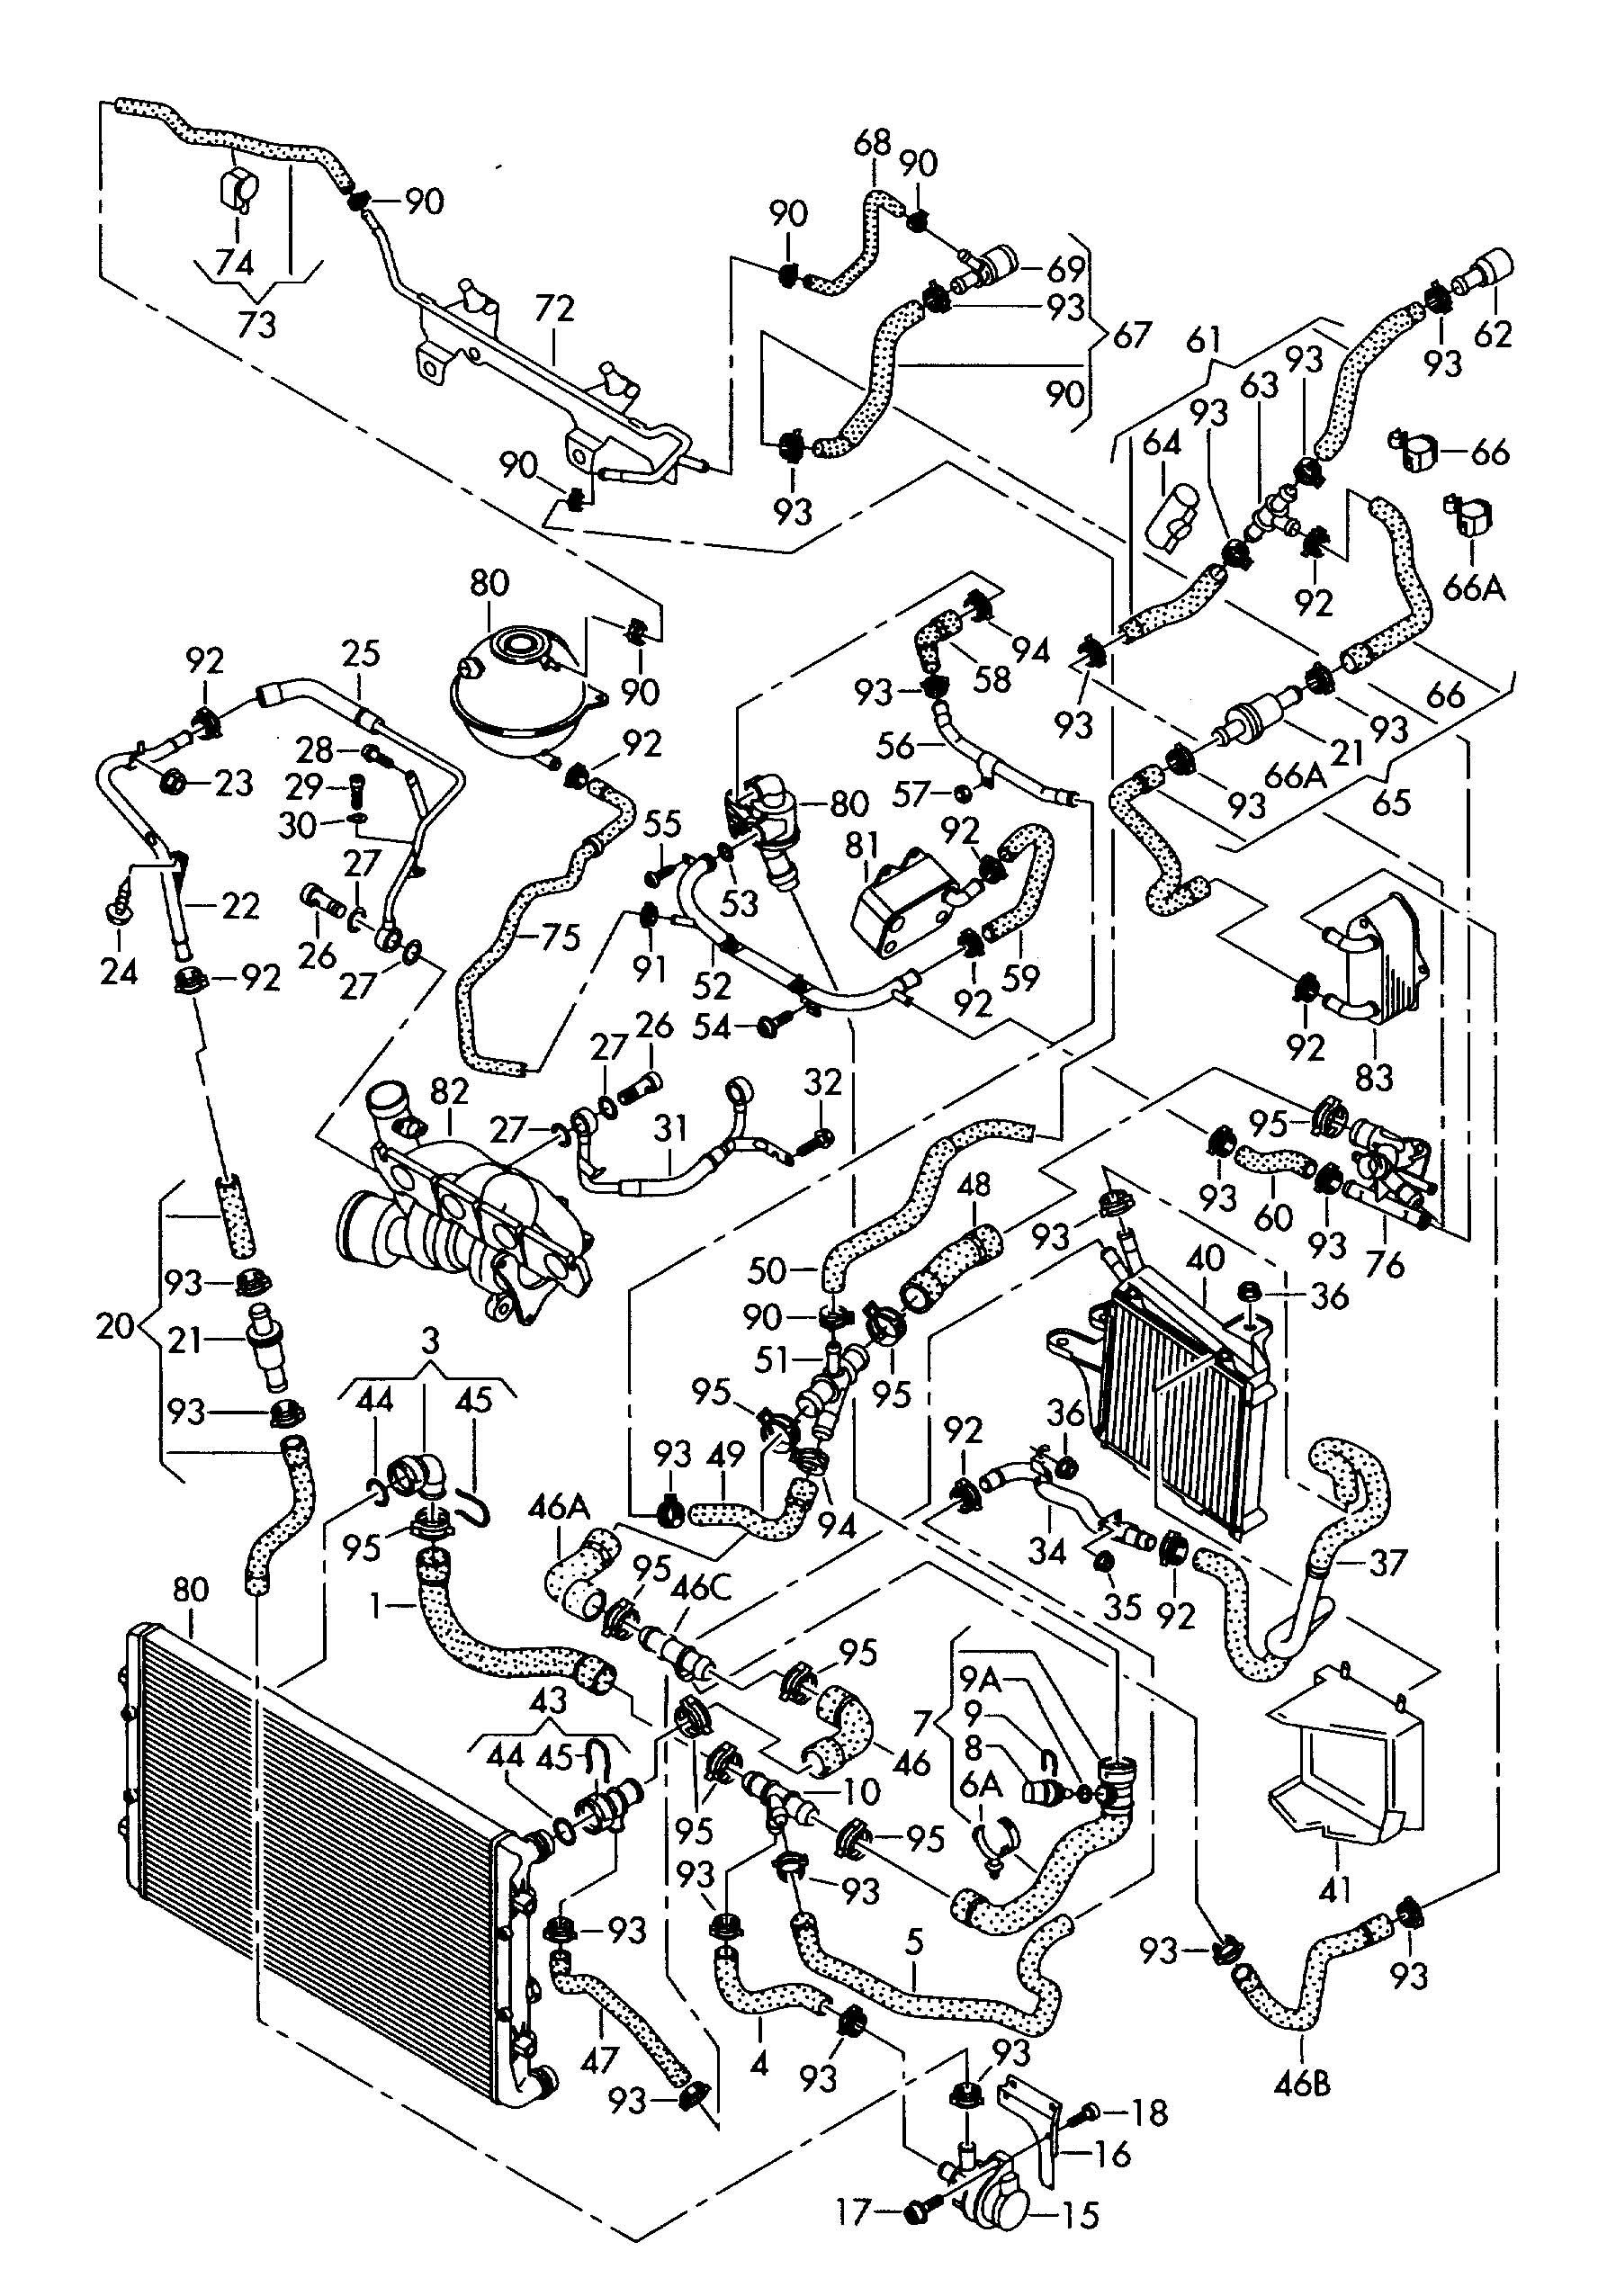 hight resolution of 1997 seadoo wiring diagram